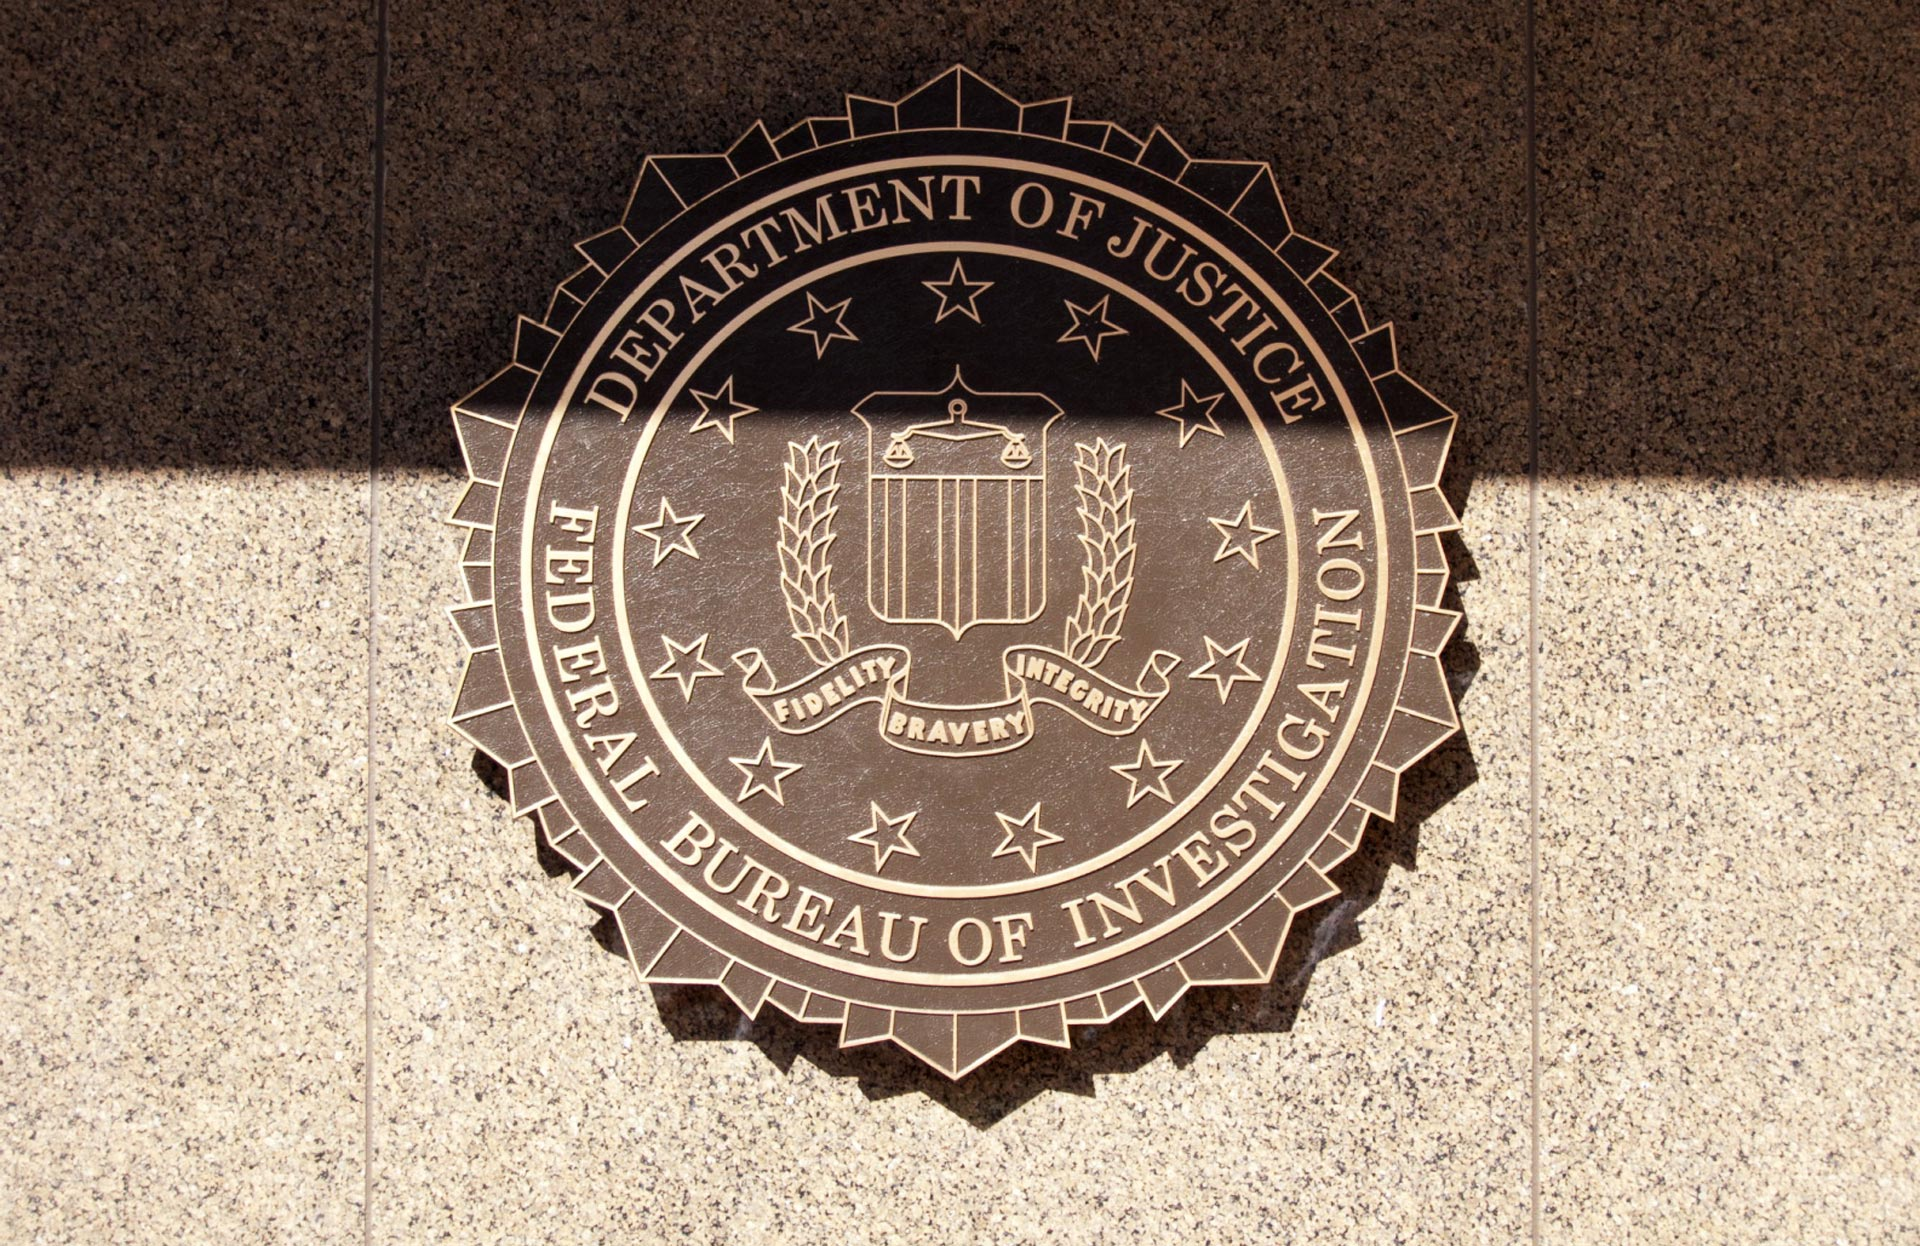 The F.B.I. emblem on the J. Edgar Hoover F.B.I. Building.